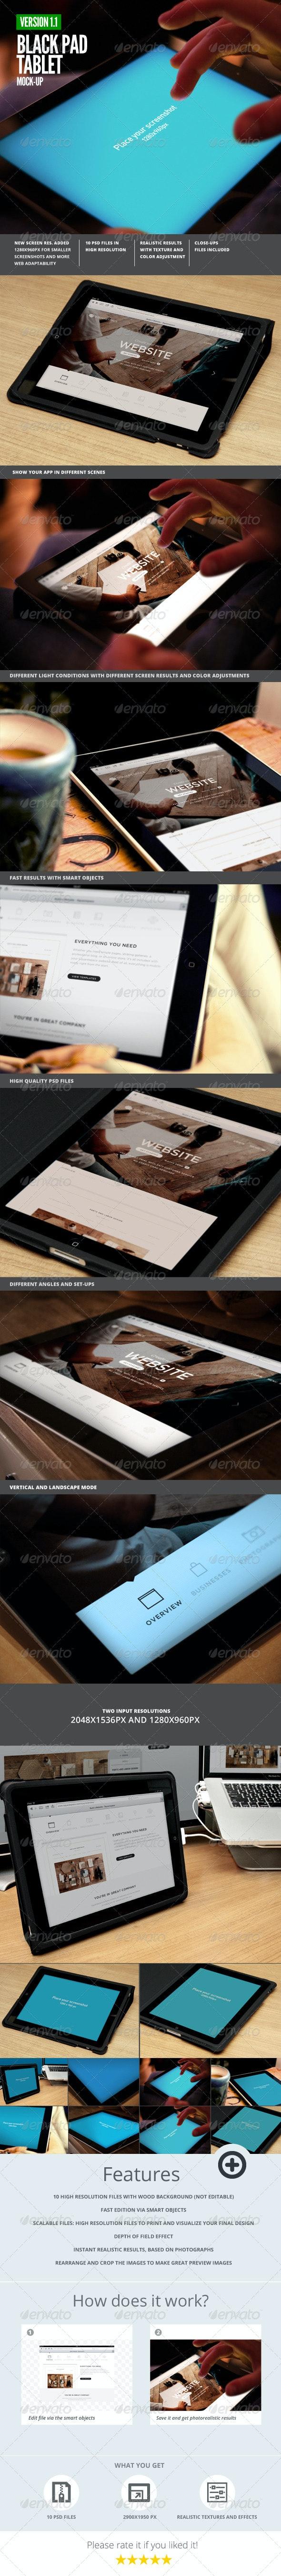 Black Pad | Tablet App UI Mock-Up - Mobile Displays